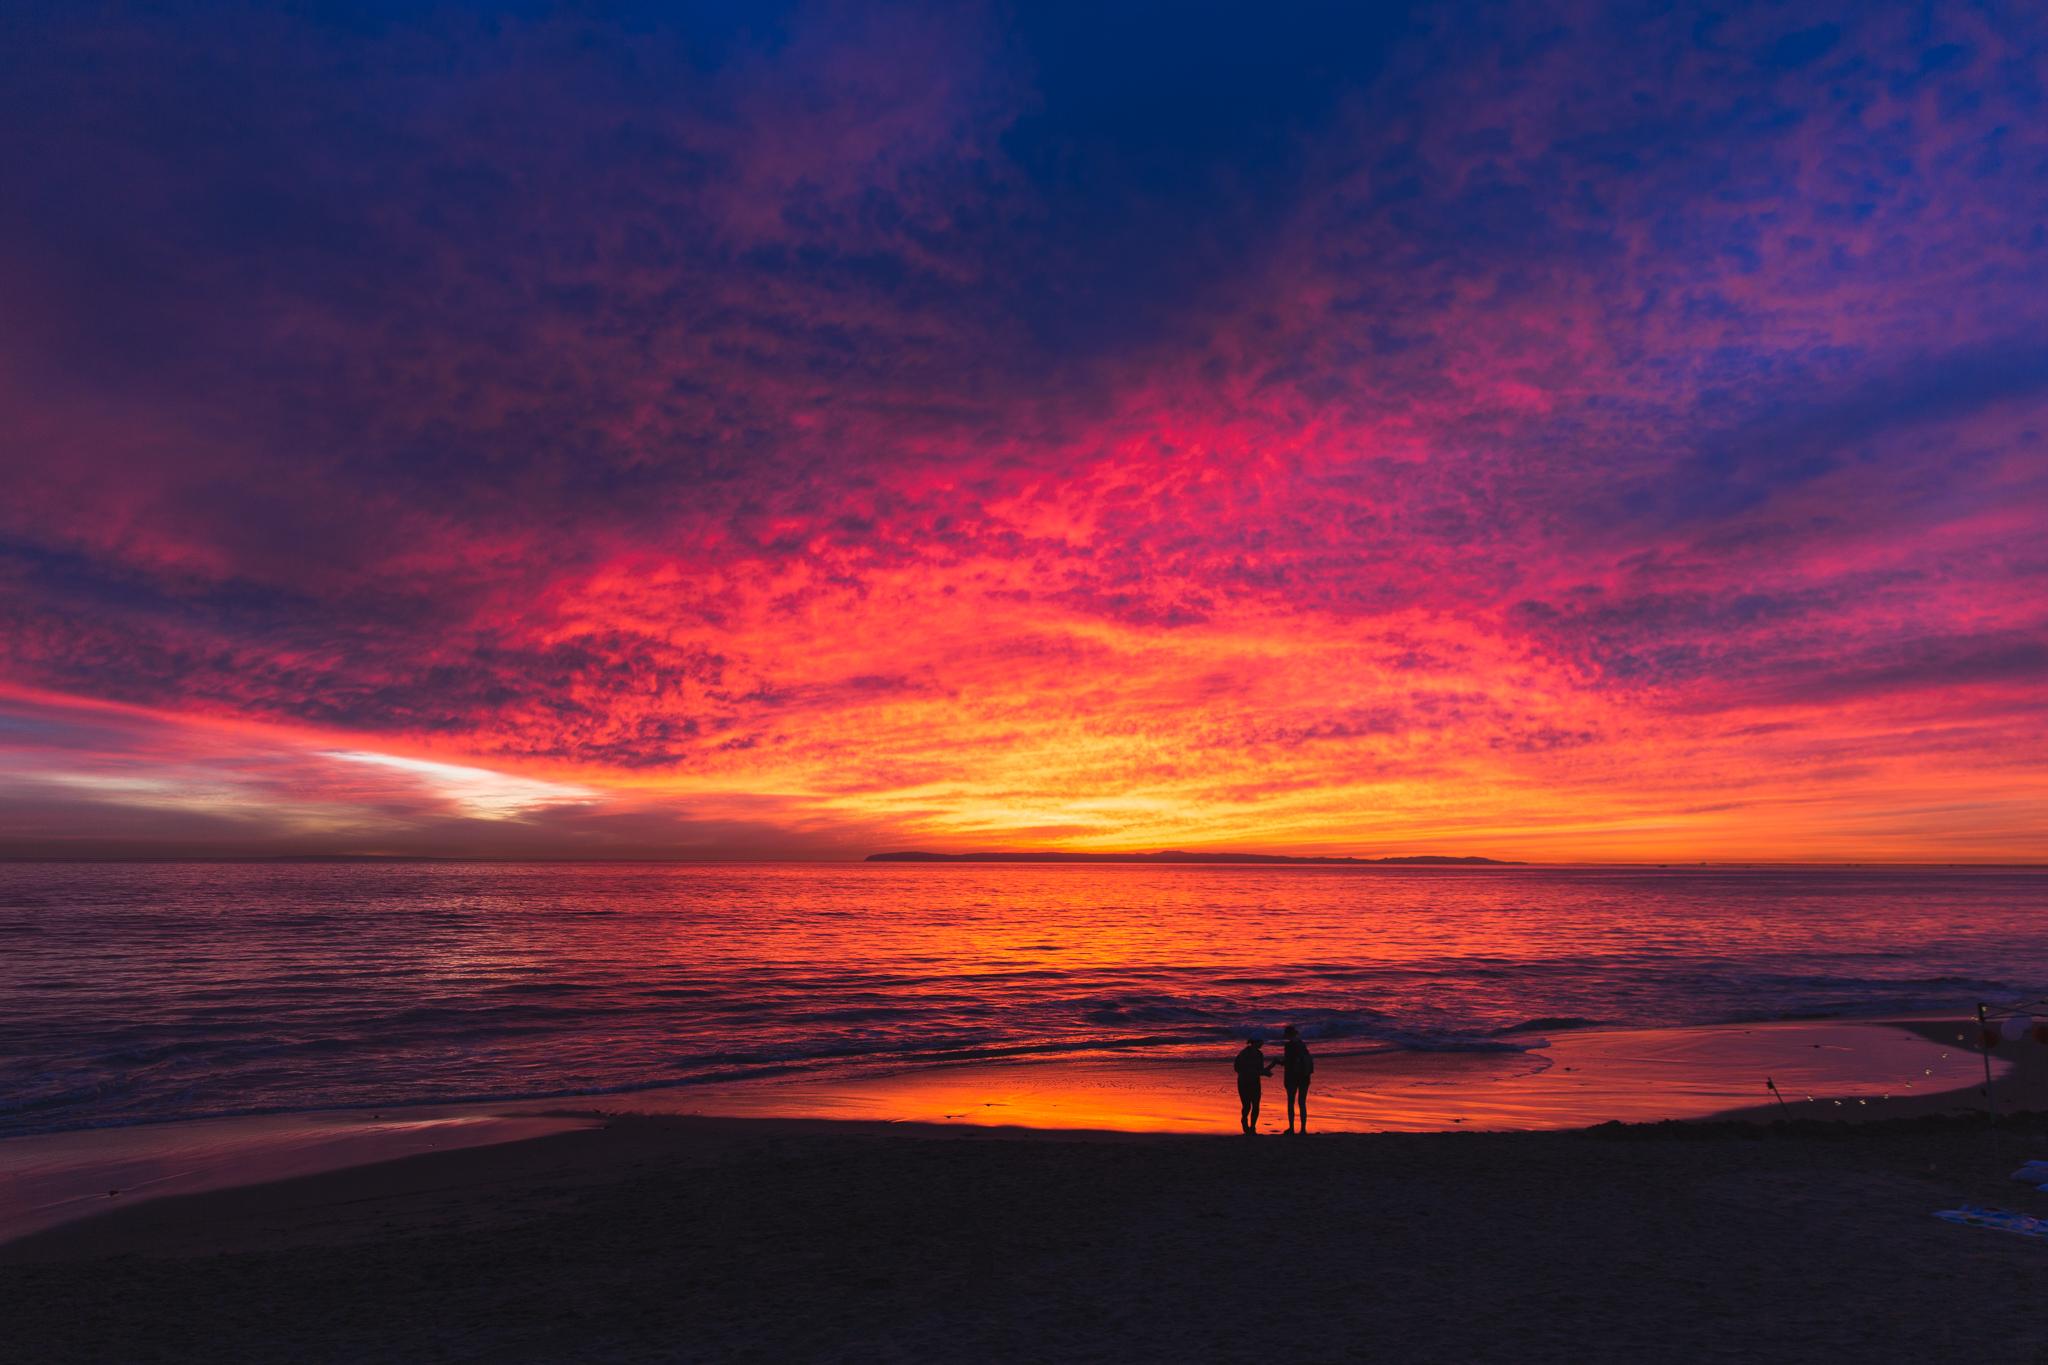 Babettes_Takeaway_Sunset_Jasmine-11.jpg